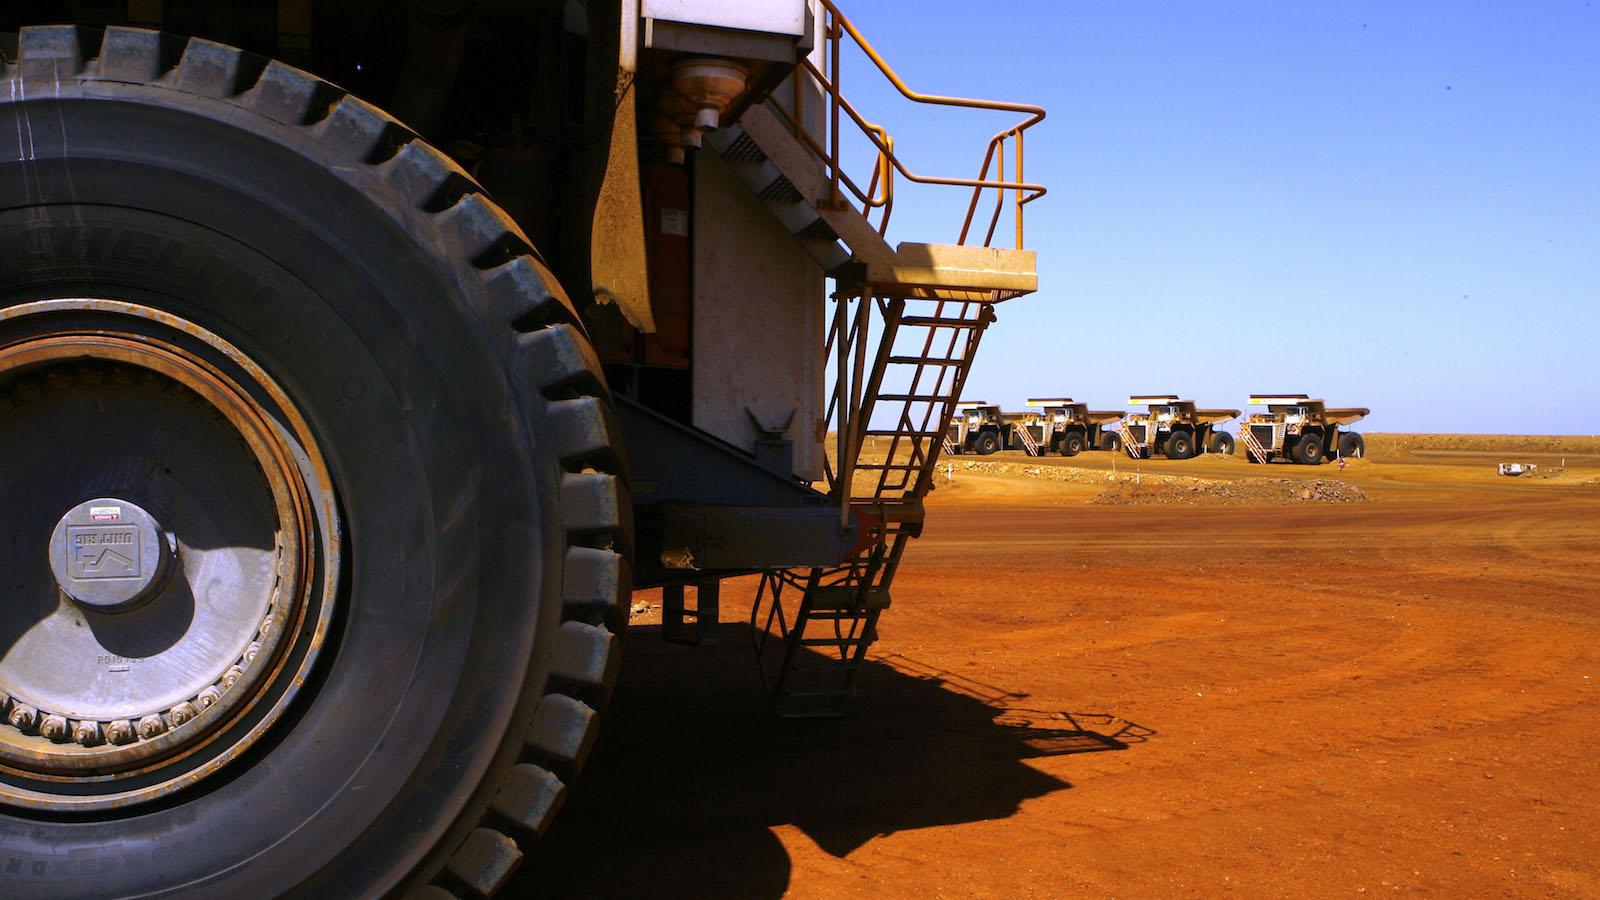 Mining giant Rio Tinto using driverless trucks at its mines |Rio Tinto Mine Truck Wrecks